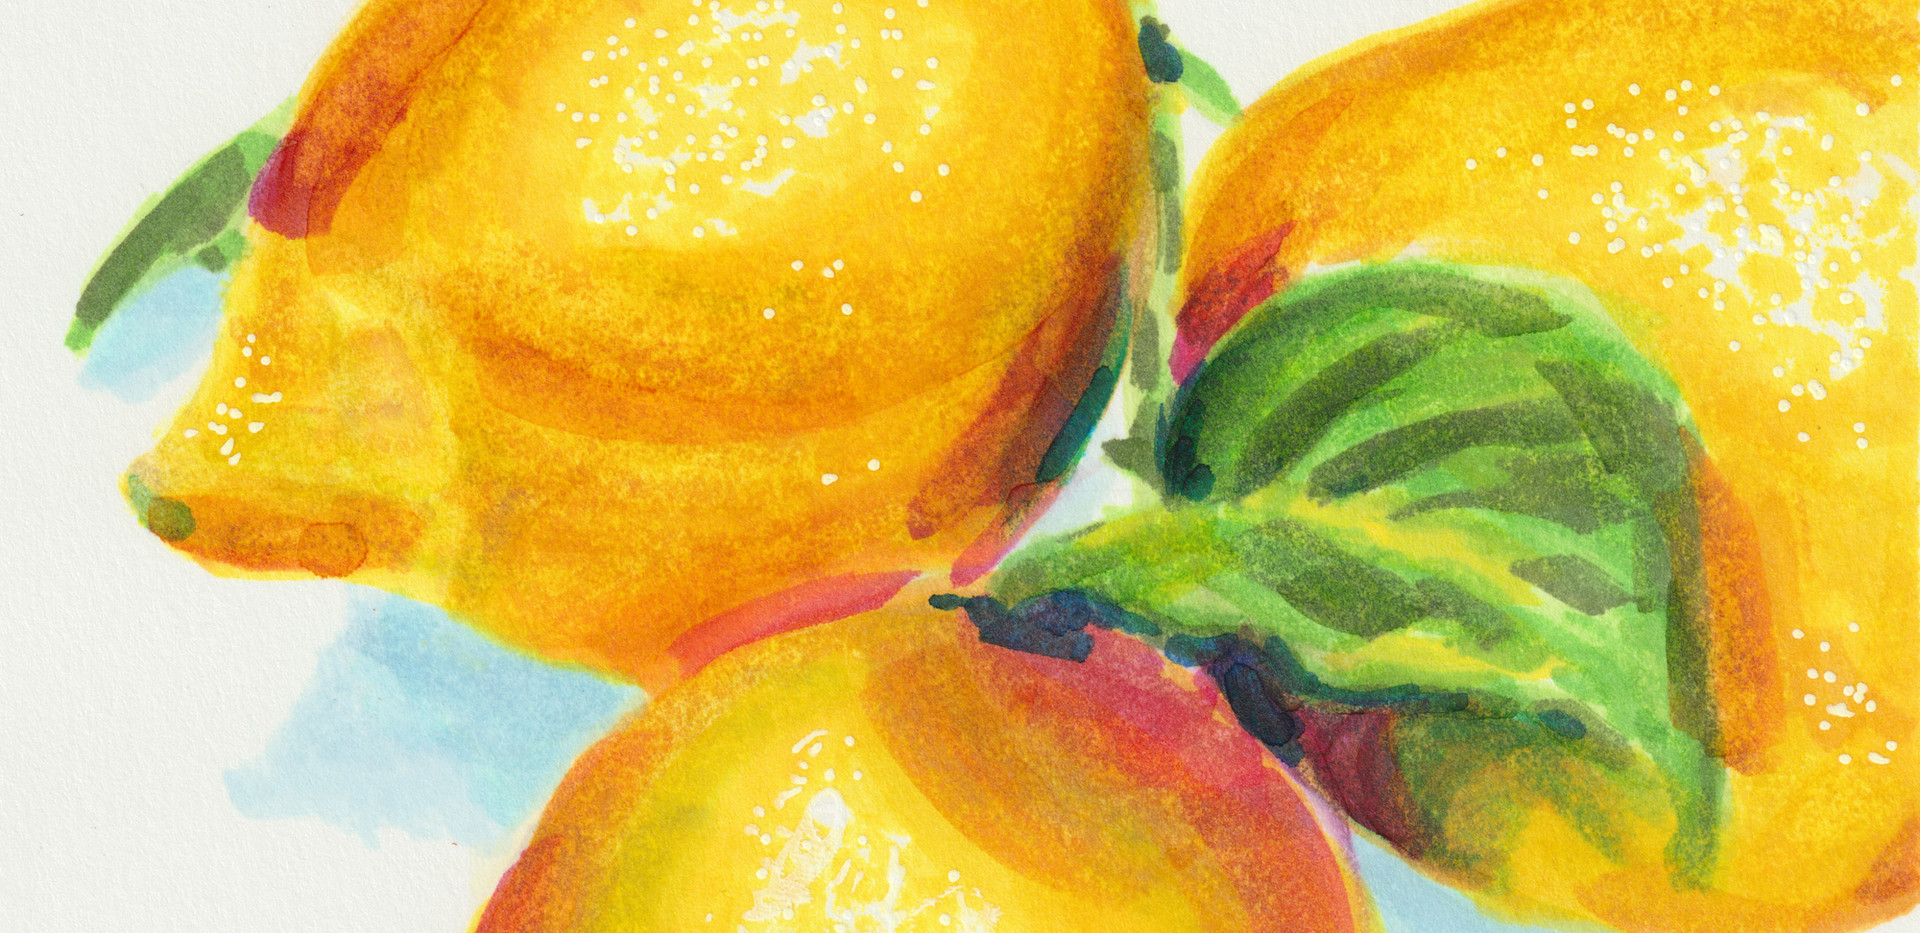 Lemon Marker Drawing.jpeg